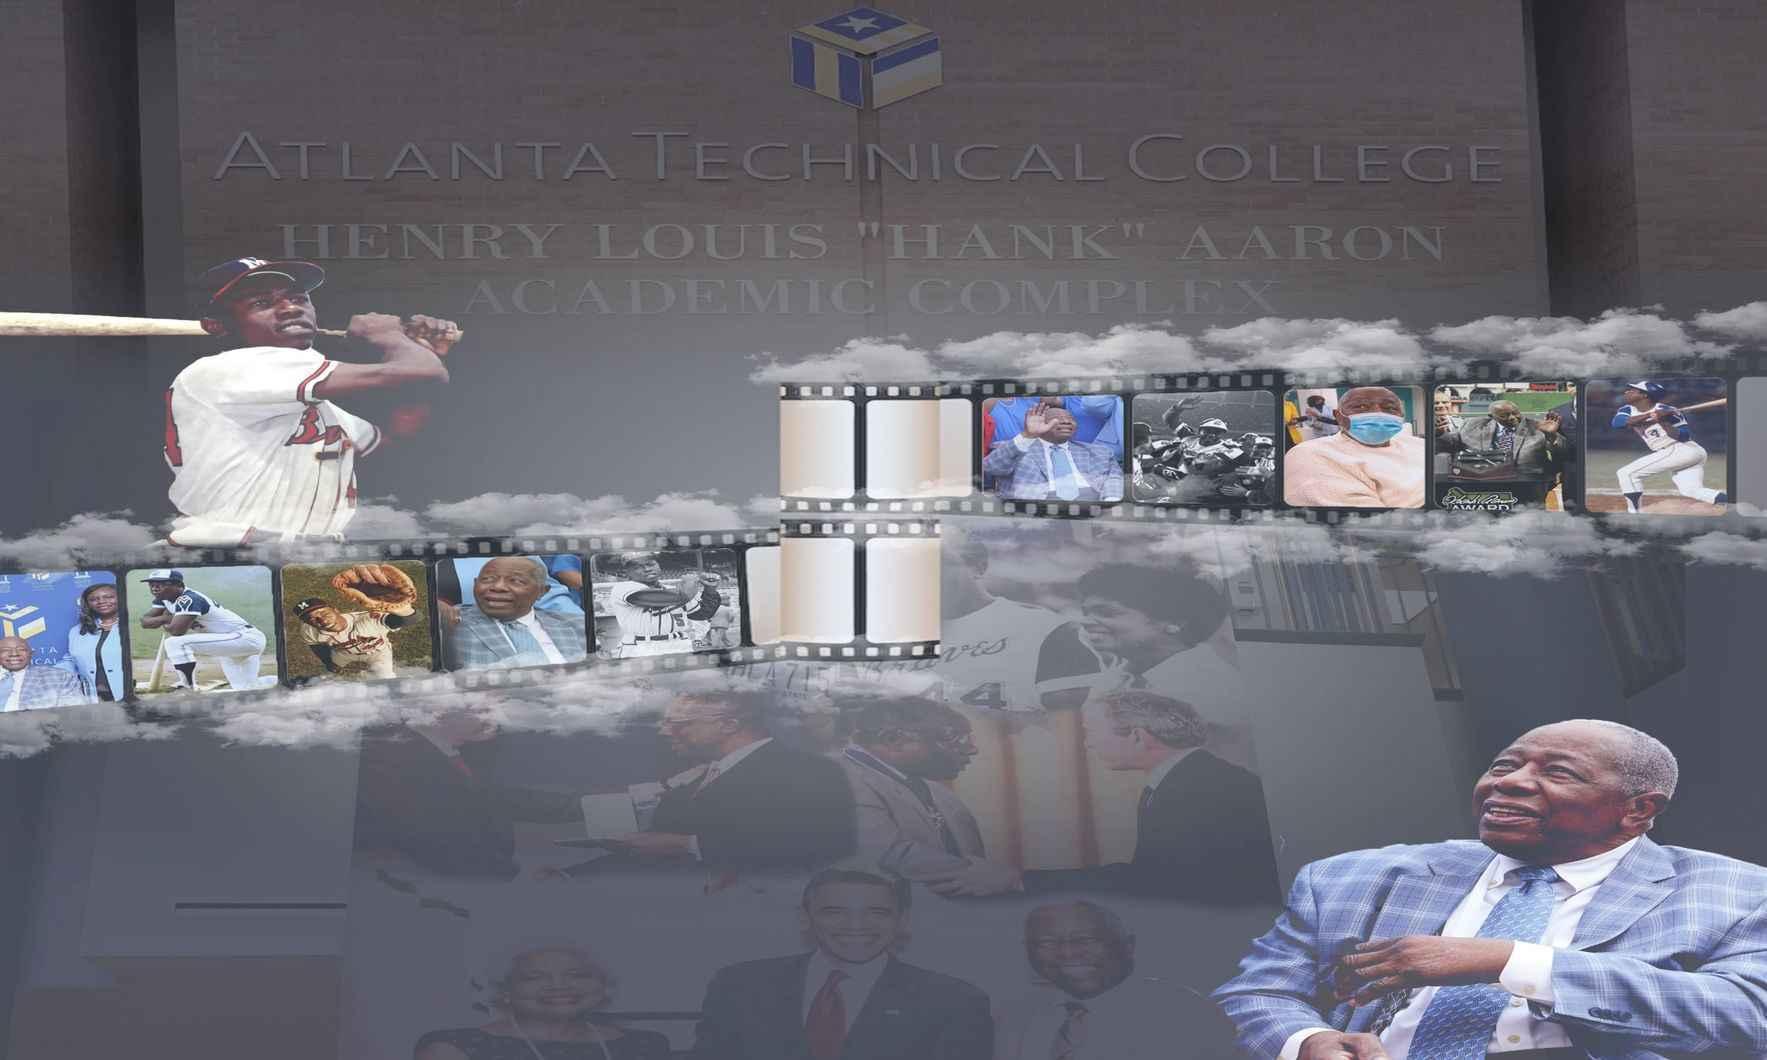 Hank Aaron 755 Society image